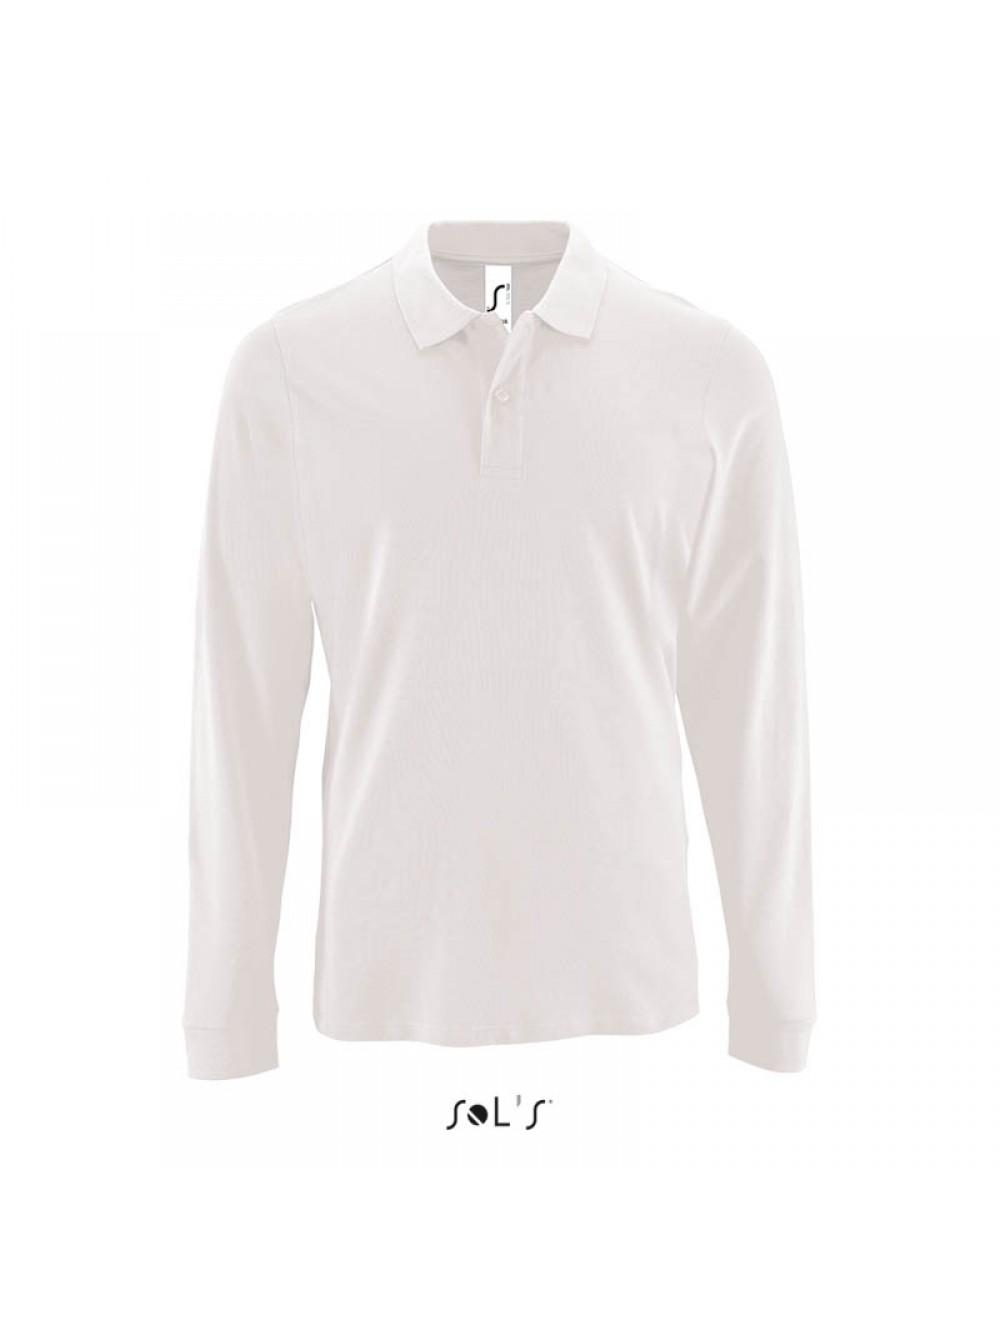 2eee831db4e5b Мужская рубашка поло с длинным рукавом PERFECT LSL MEN. Артикул 02087